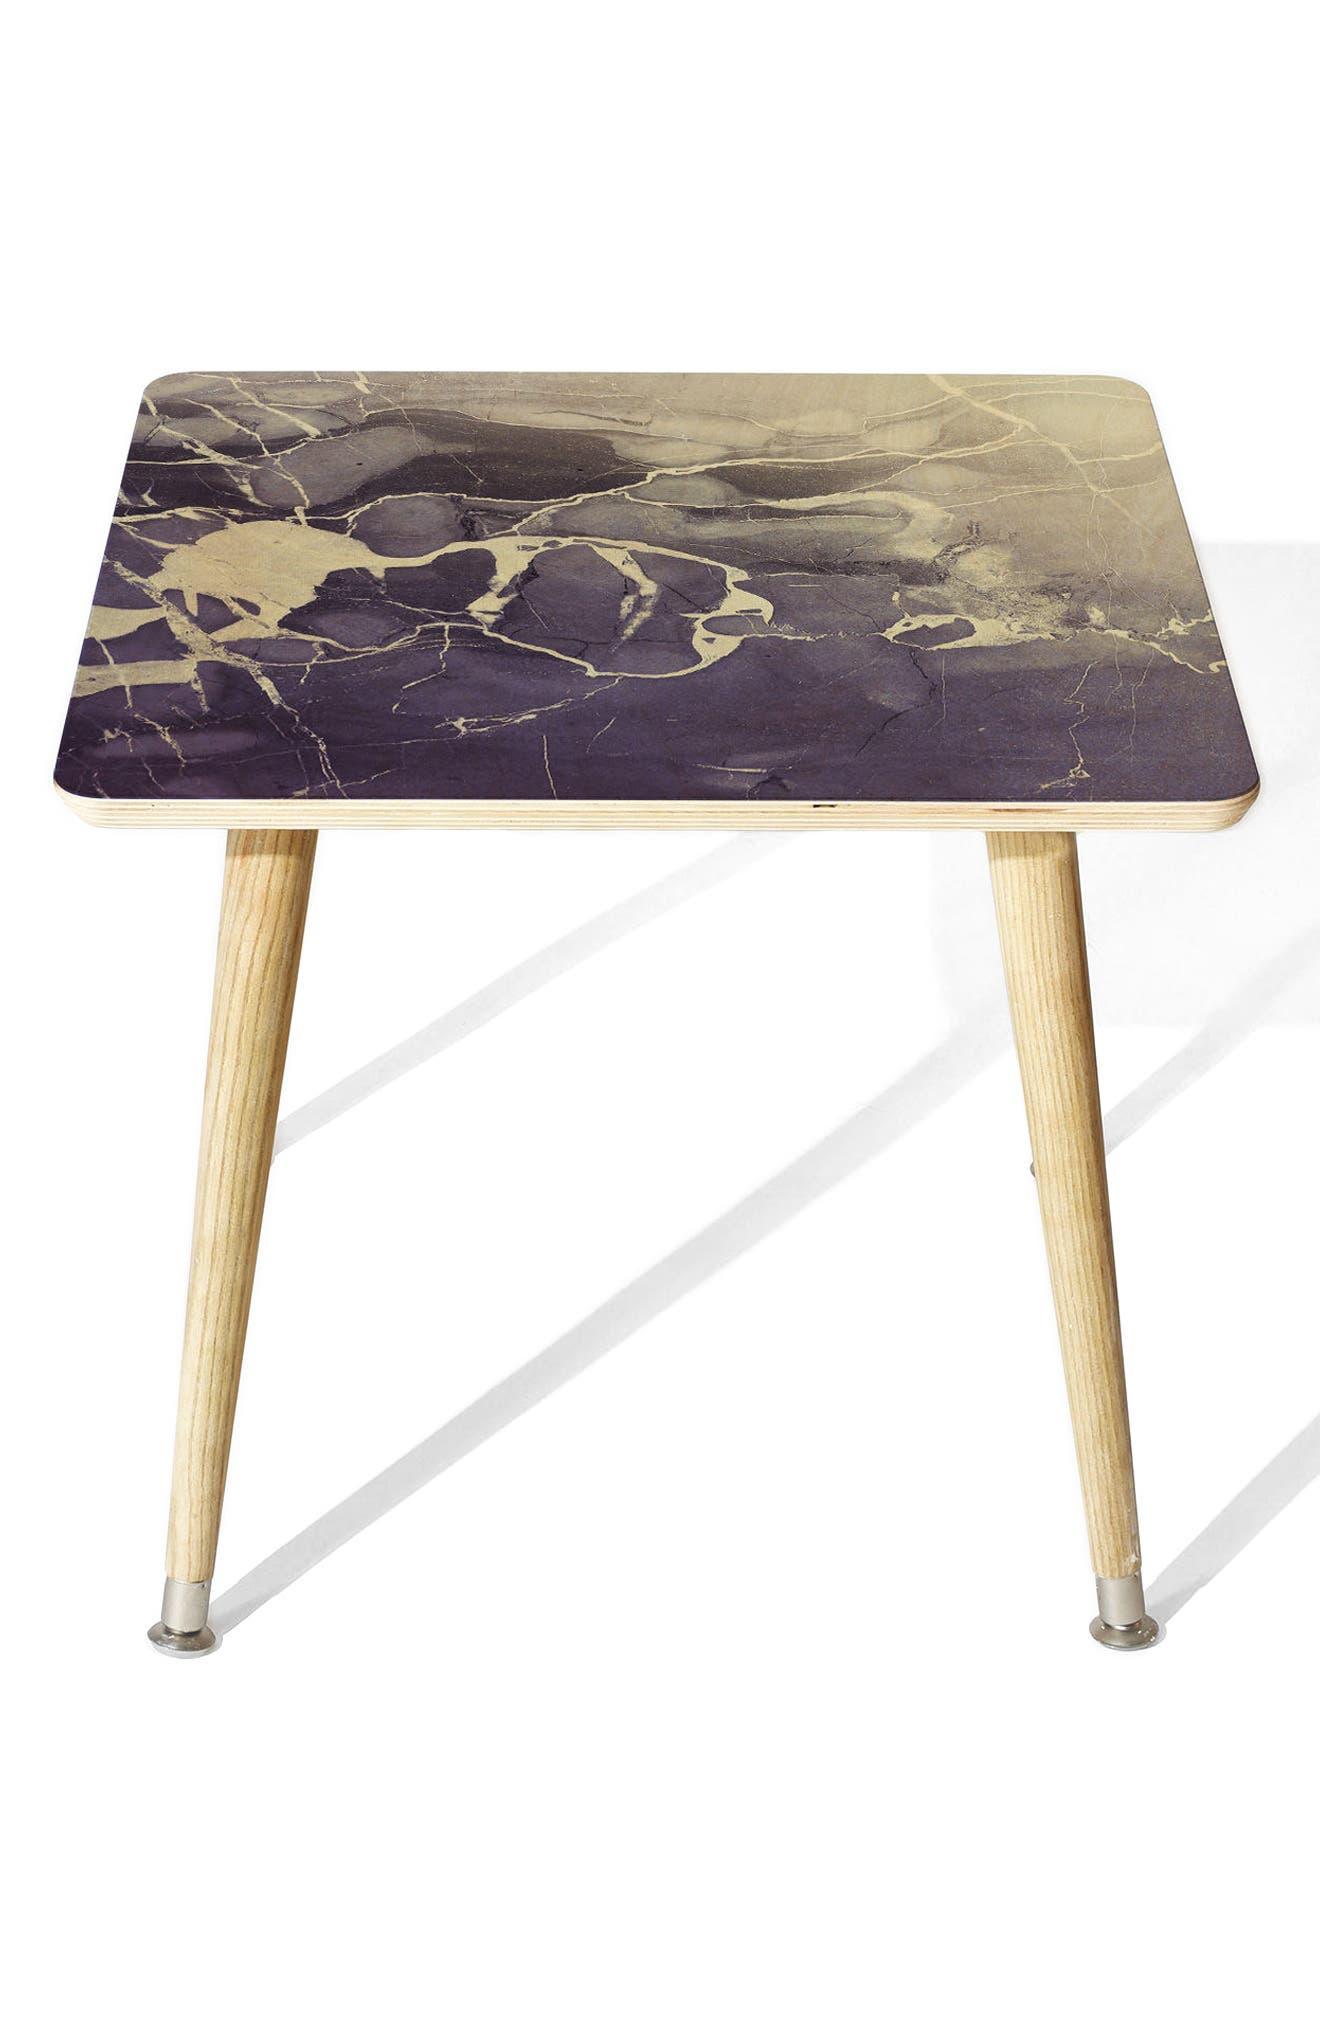 Main Image - Deny Designs Ultramarine Side Table